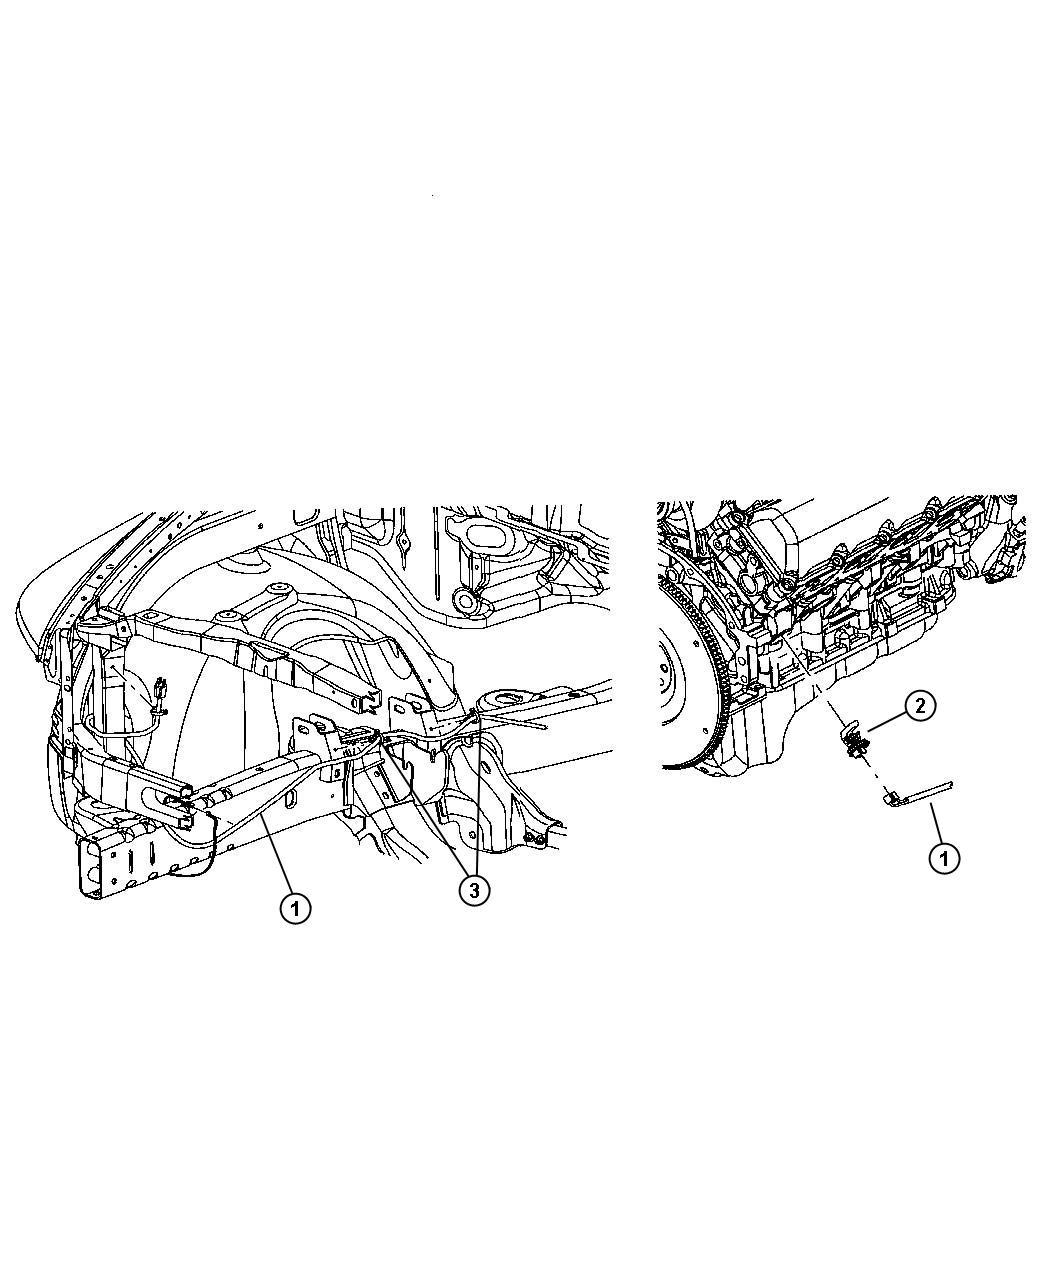 Jeep Wrangler Heater Engine Engine Block